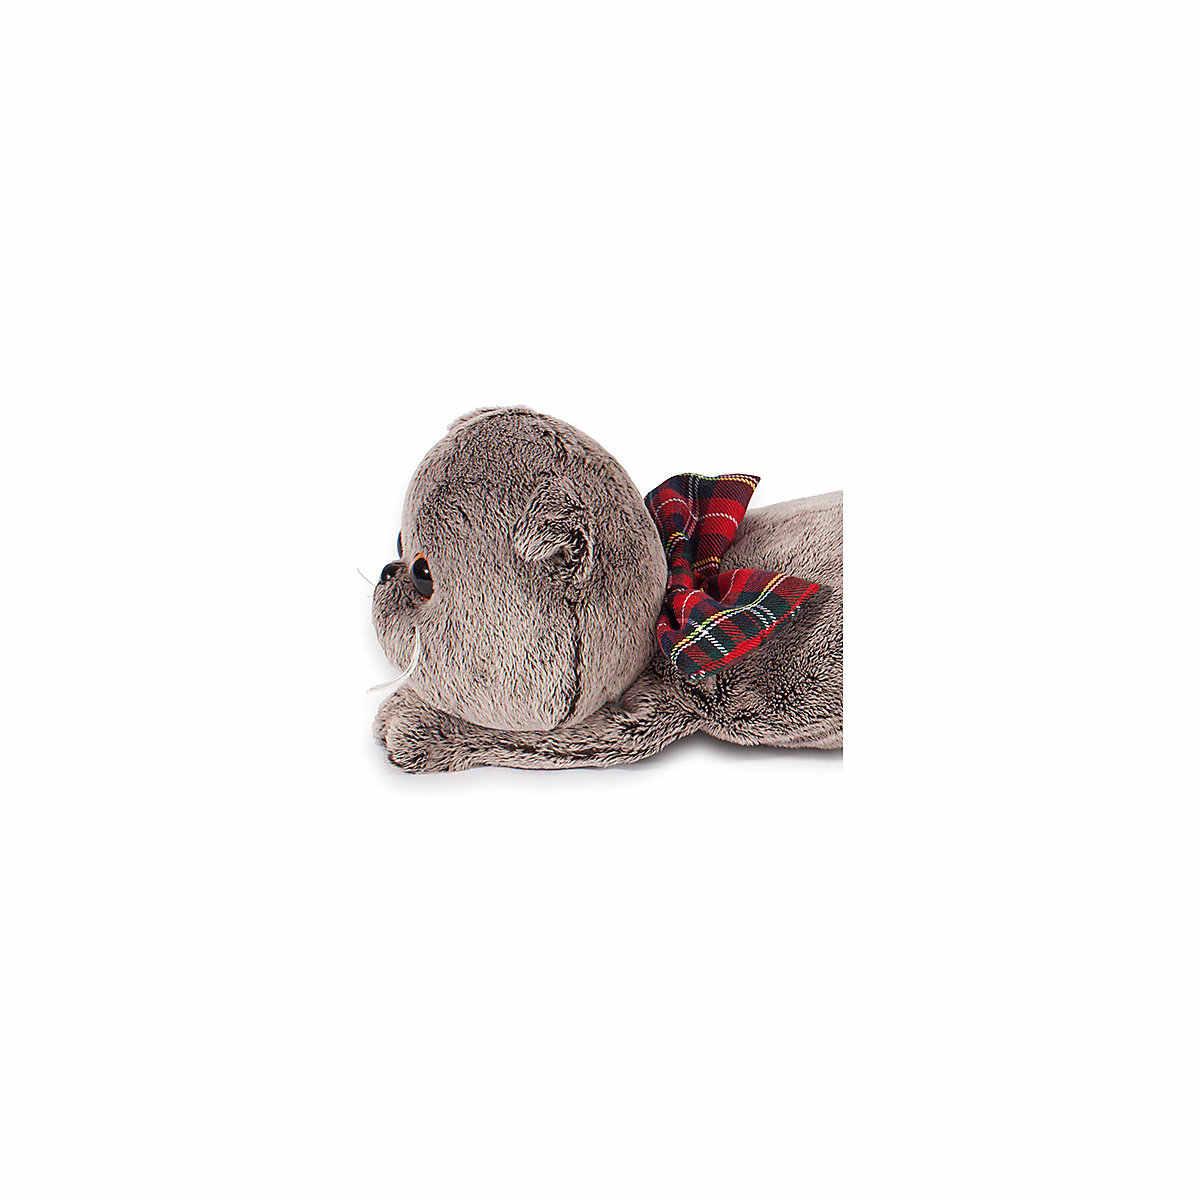 Мягкая игрушка-подушка Budi Basa Кот Басик, 40 см